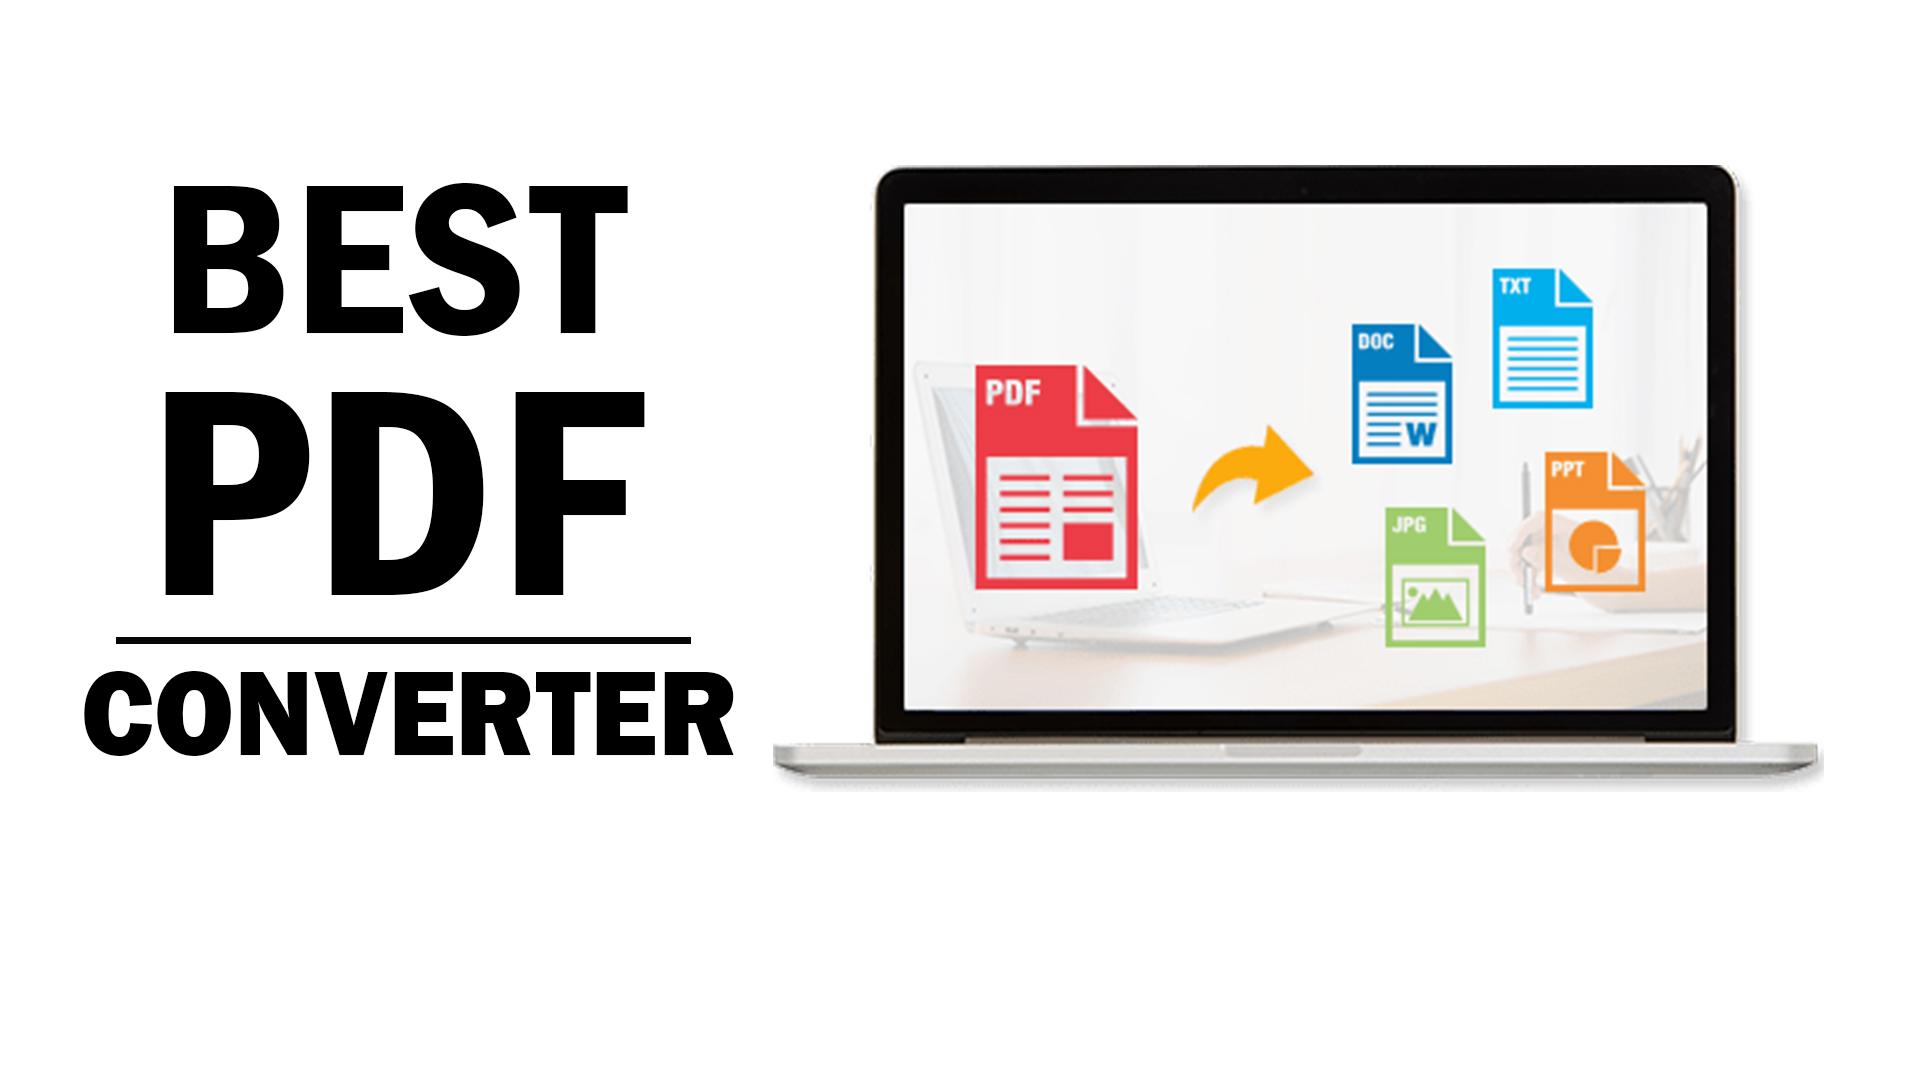 Top 10 Best PDF Converter - Top 10 Zone